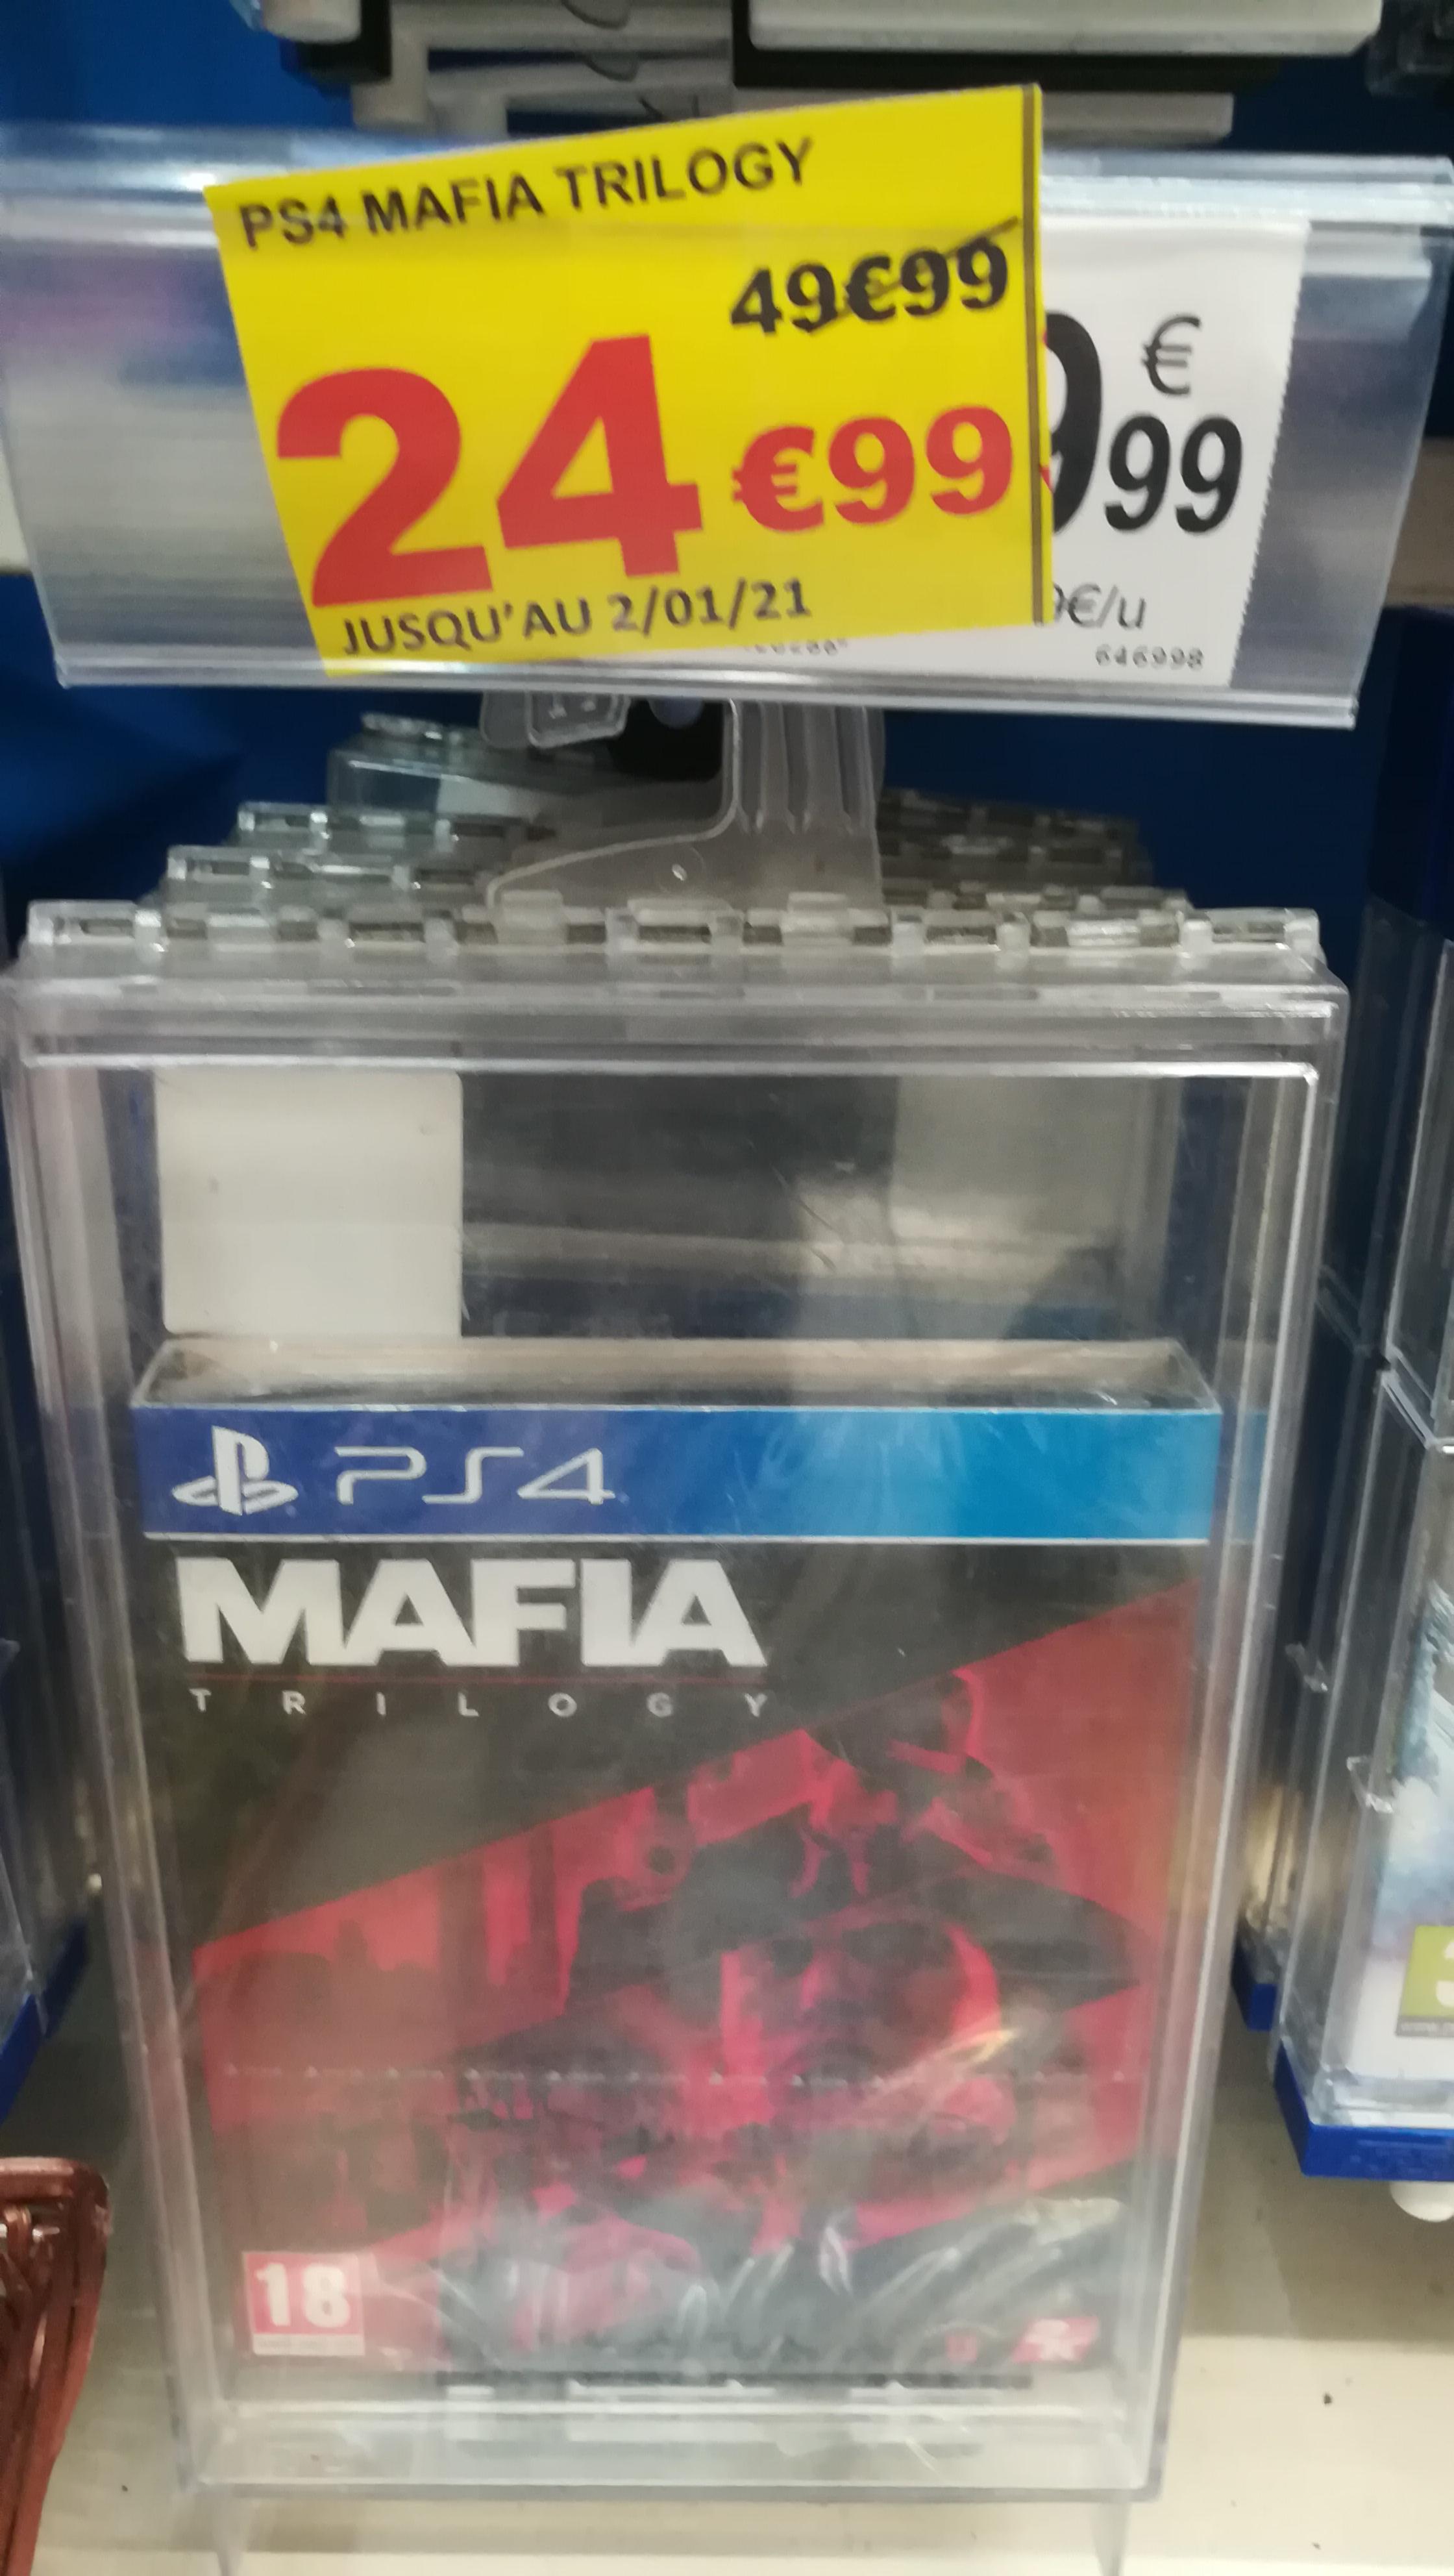 Mafia Trilogy sur PS4 ou Xbox One - Poitiers (86)